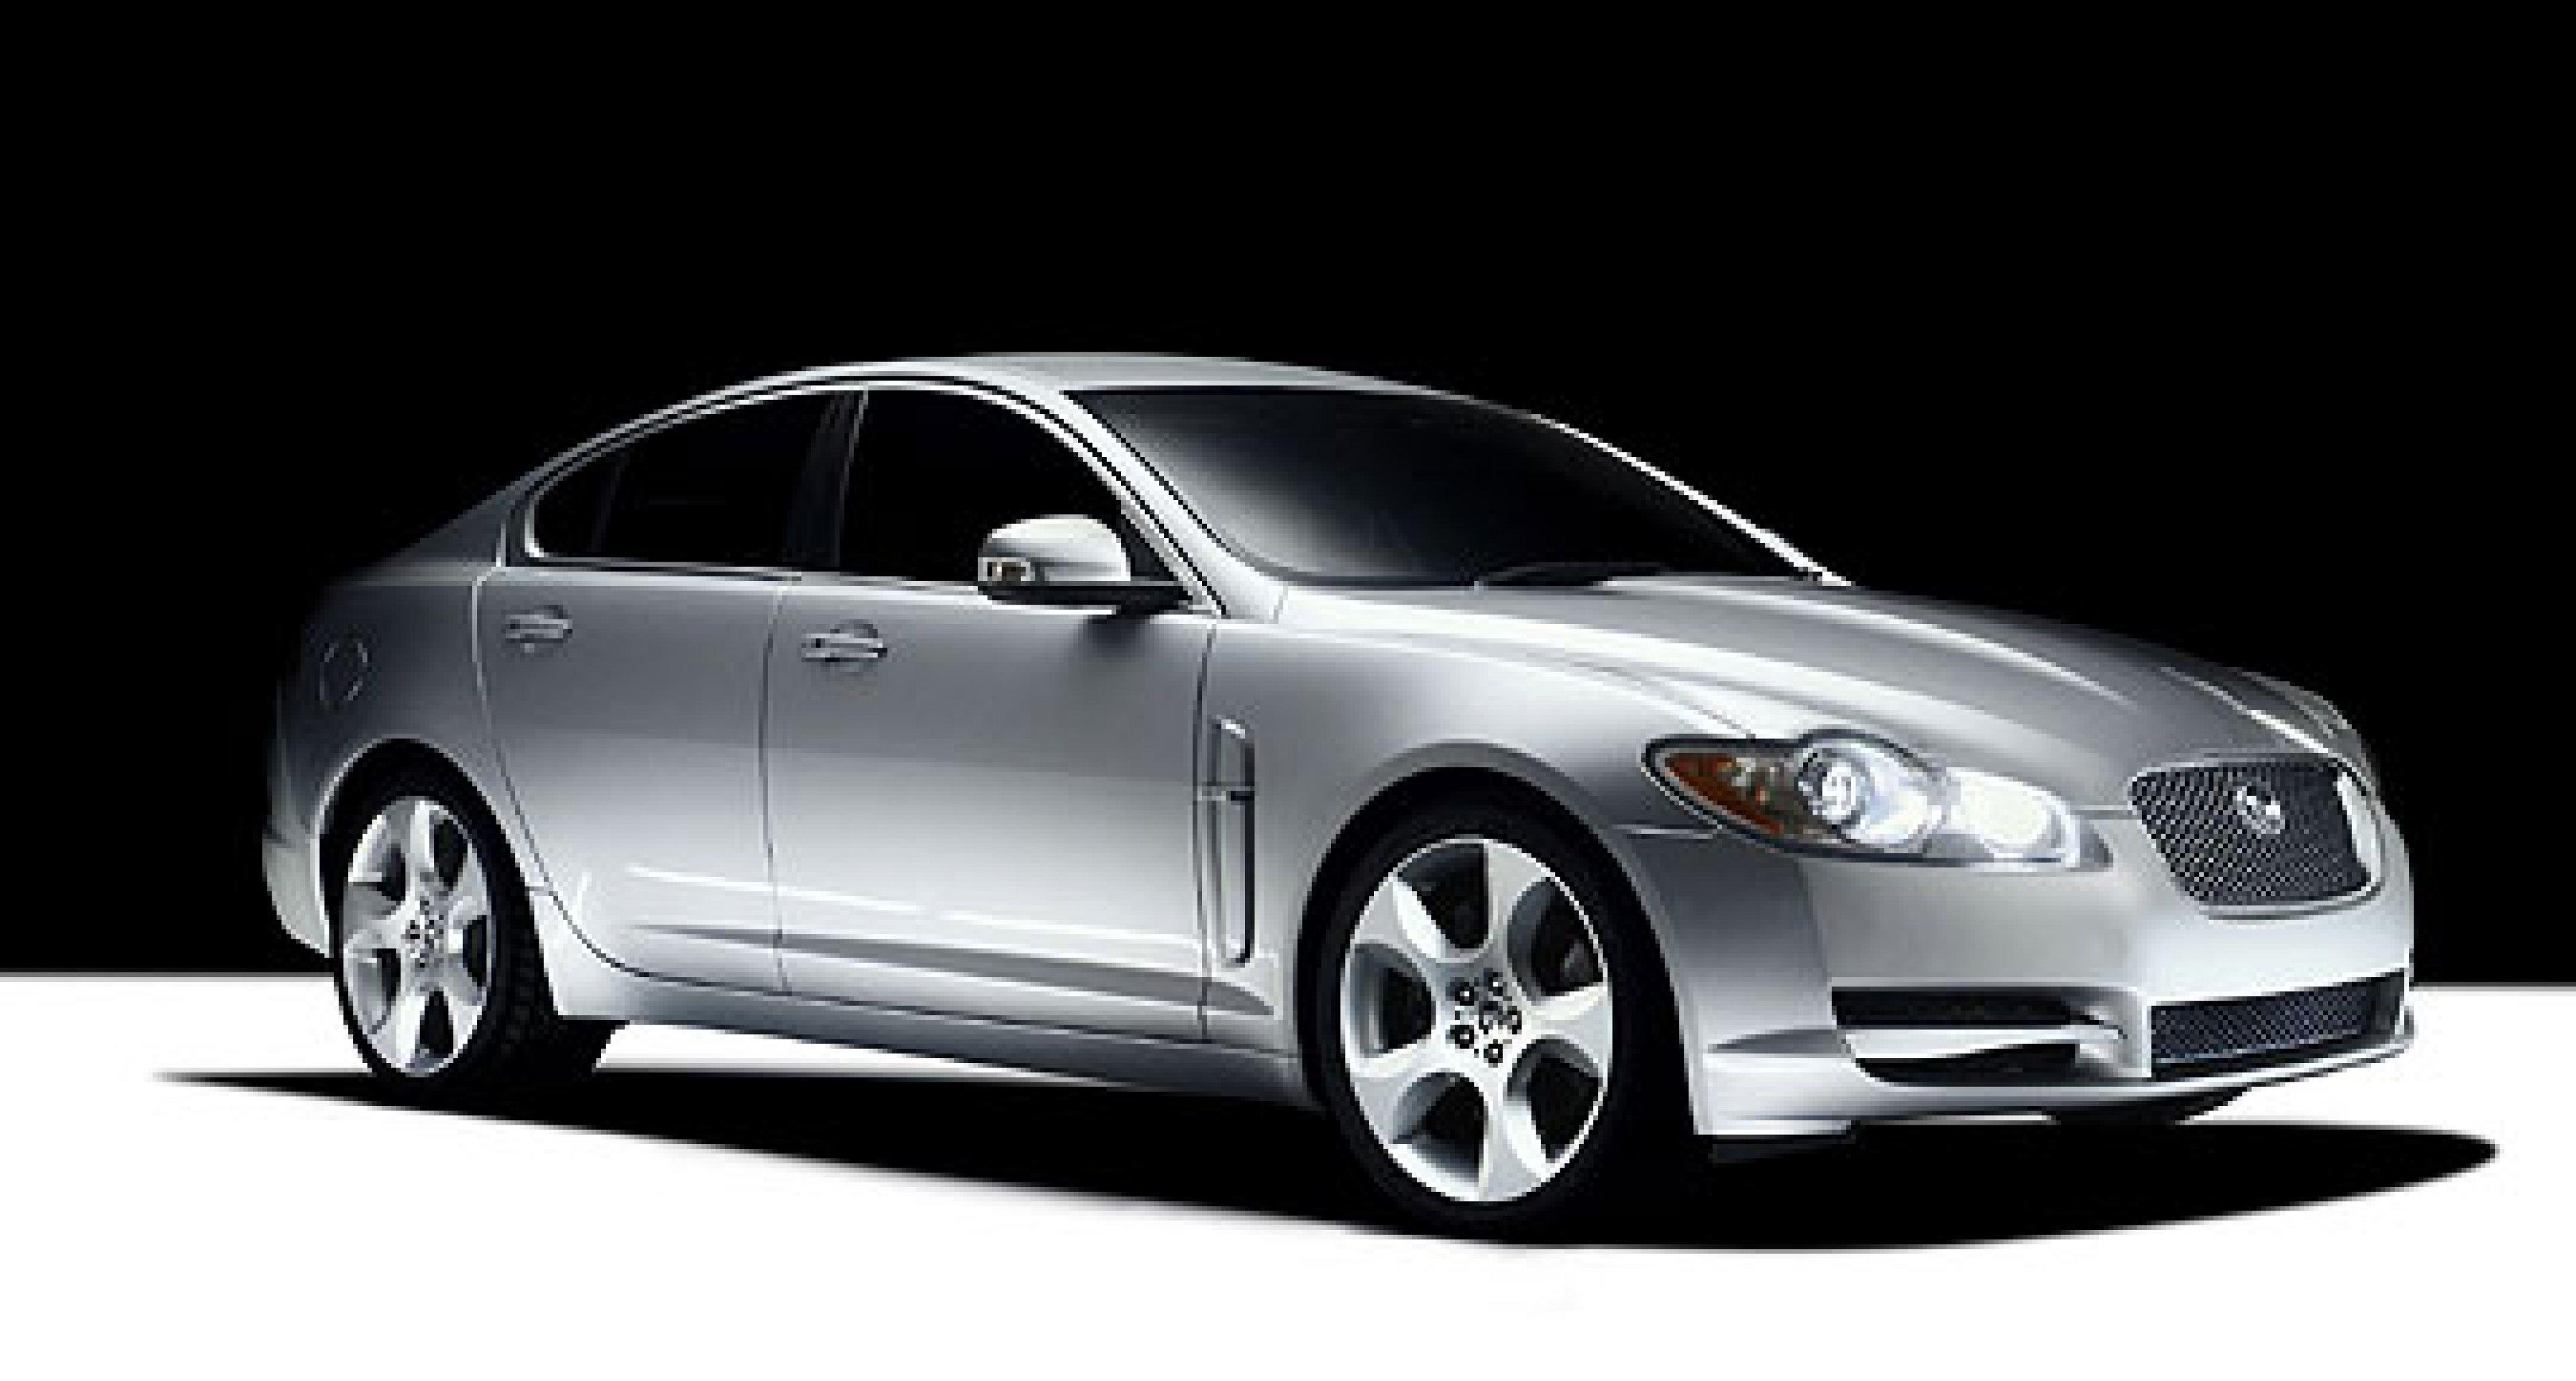 Jaguar XF - the full story